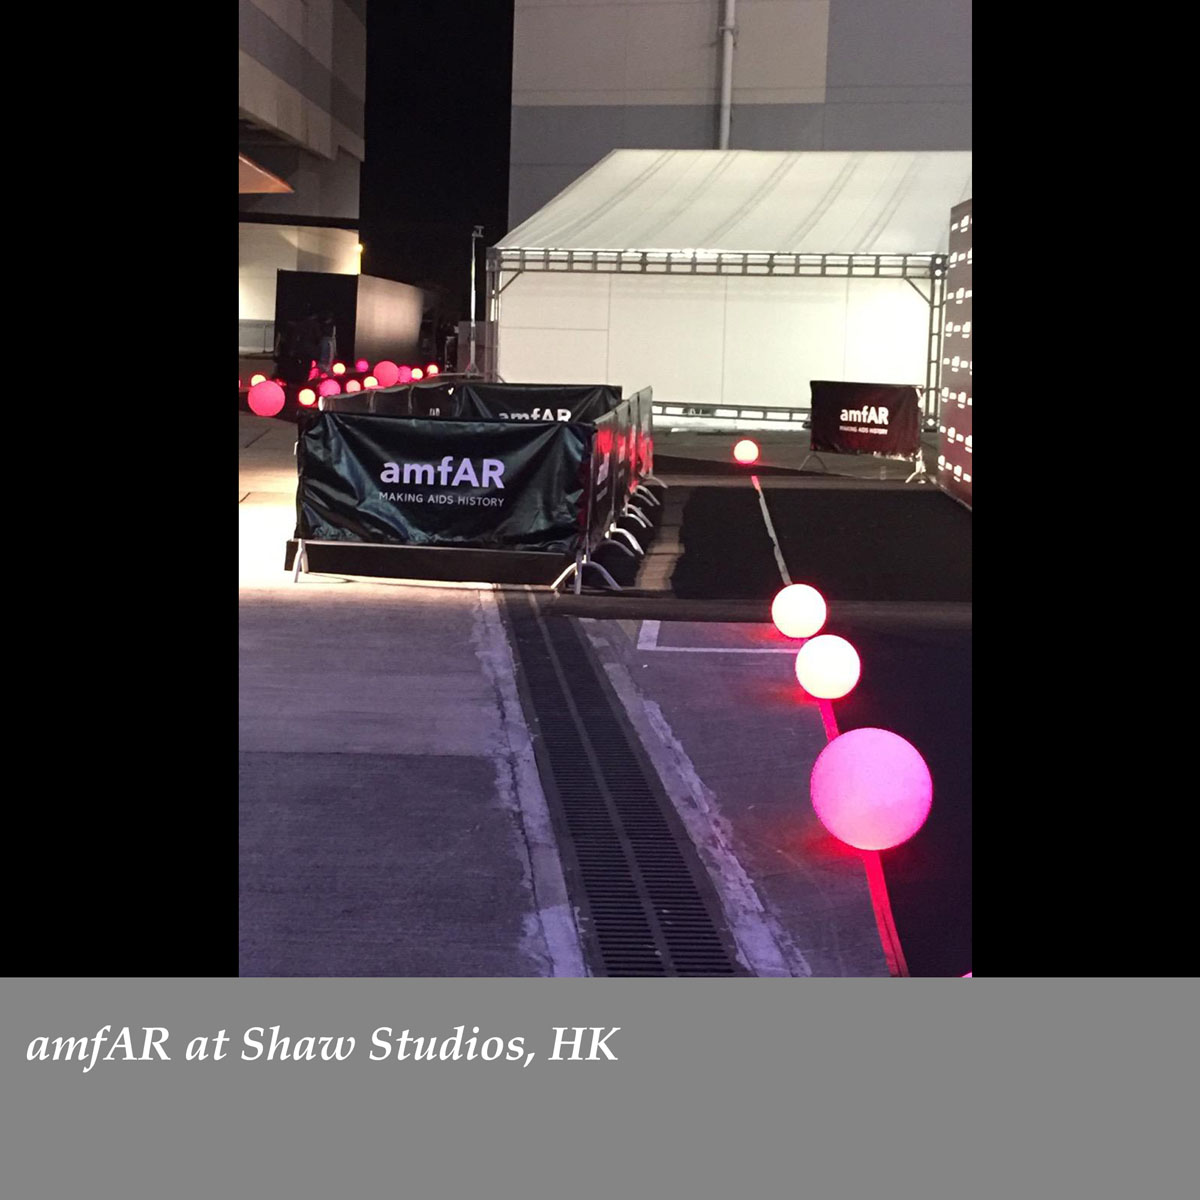 amfAR-at-Shaw-Studios-HK-2